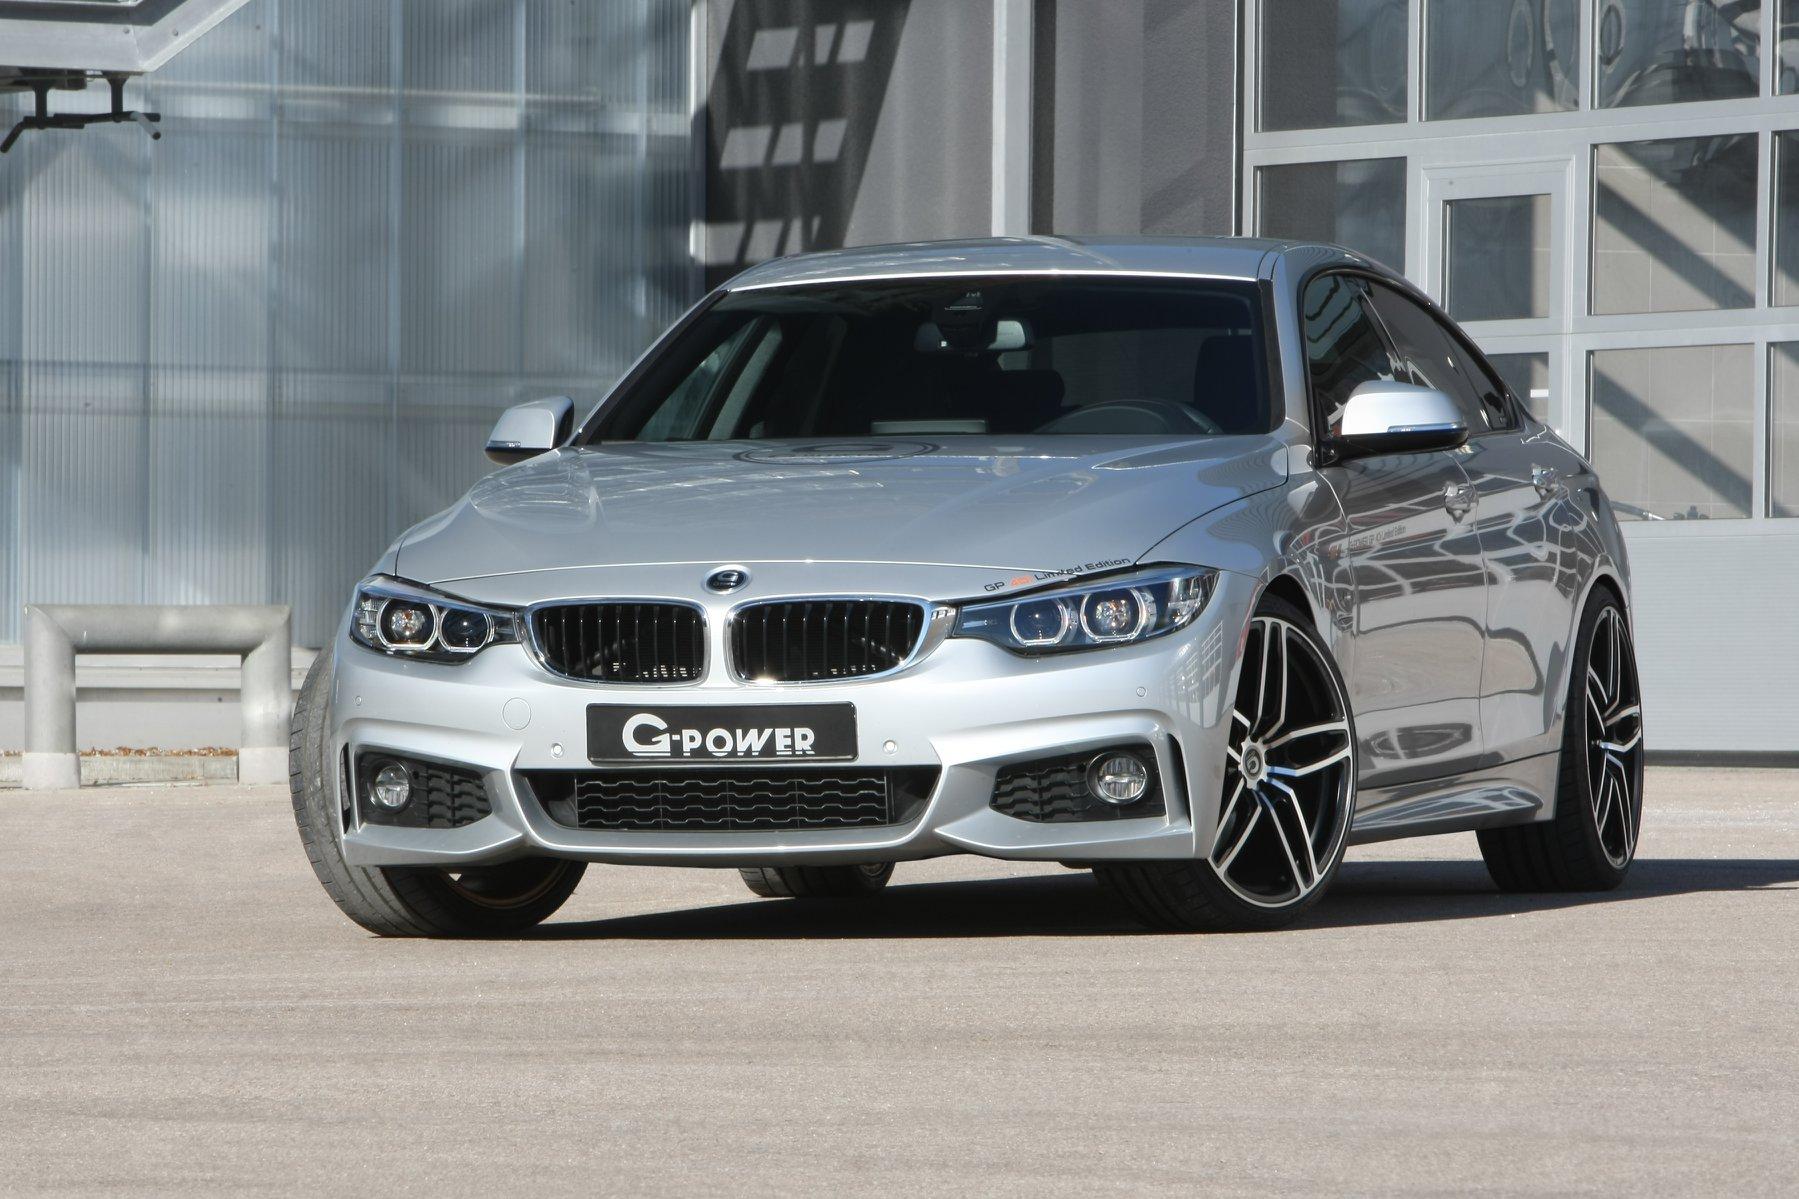 G-Power BMW 440i GP 40i Limited Edition (1)